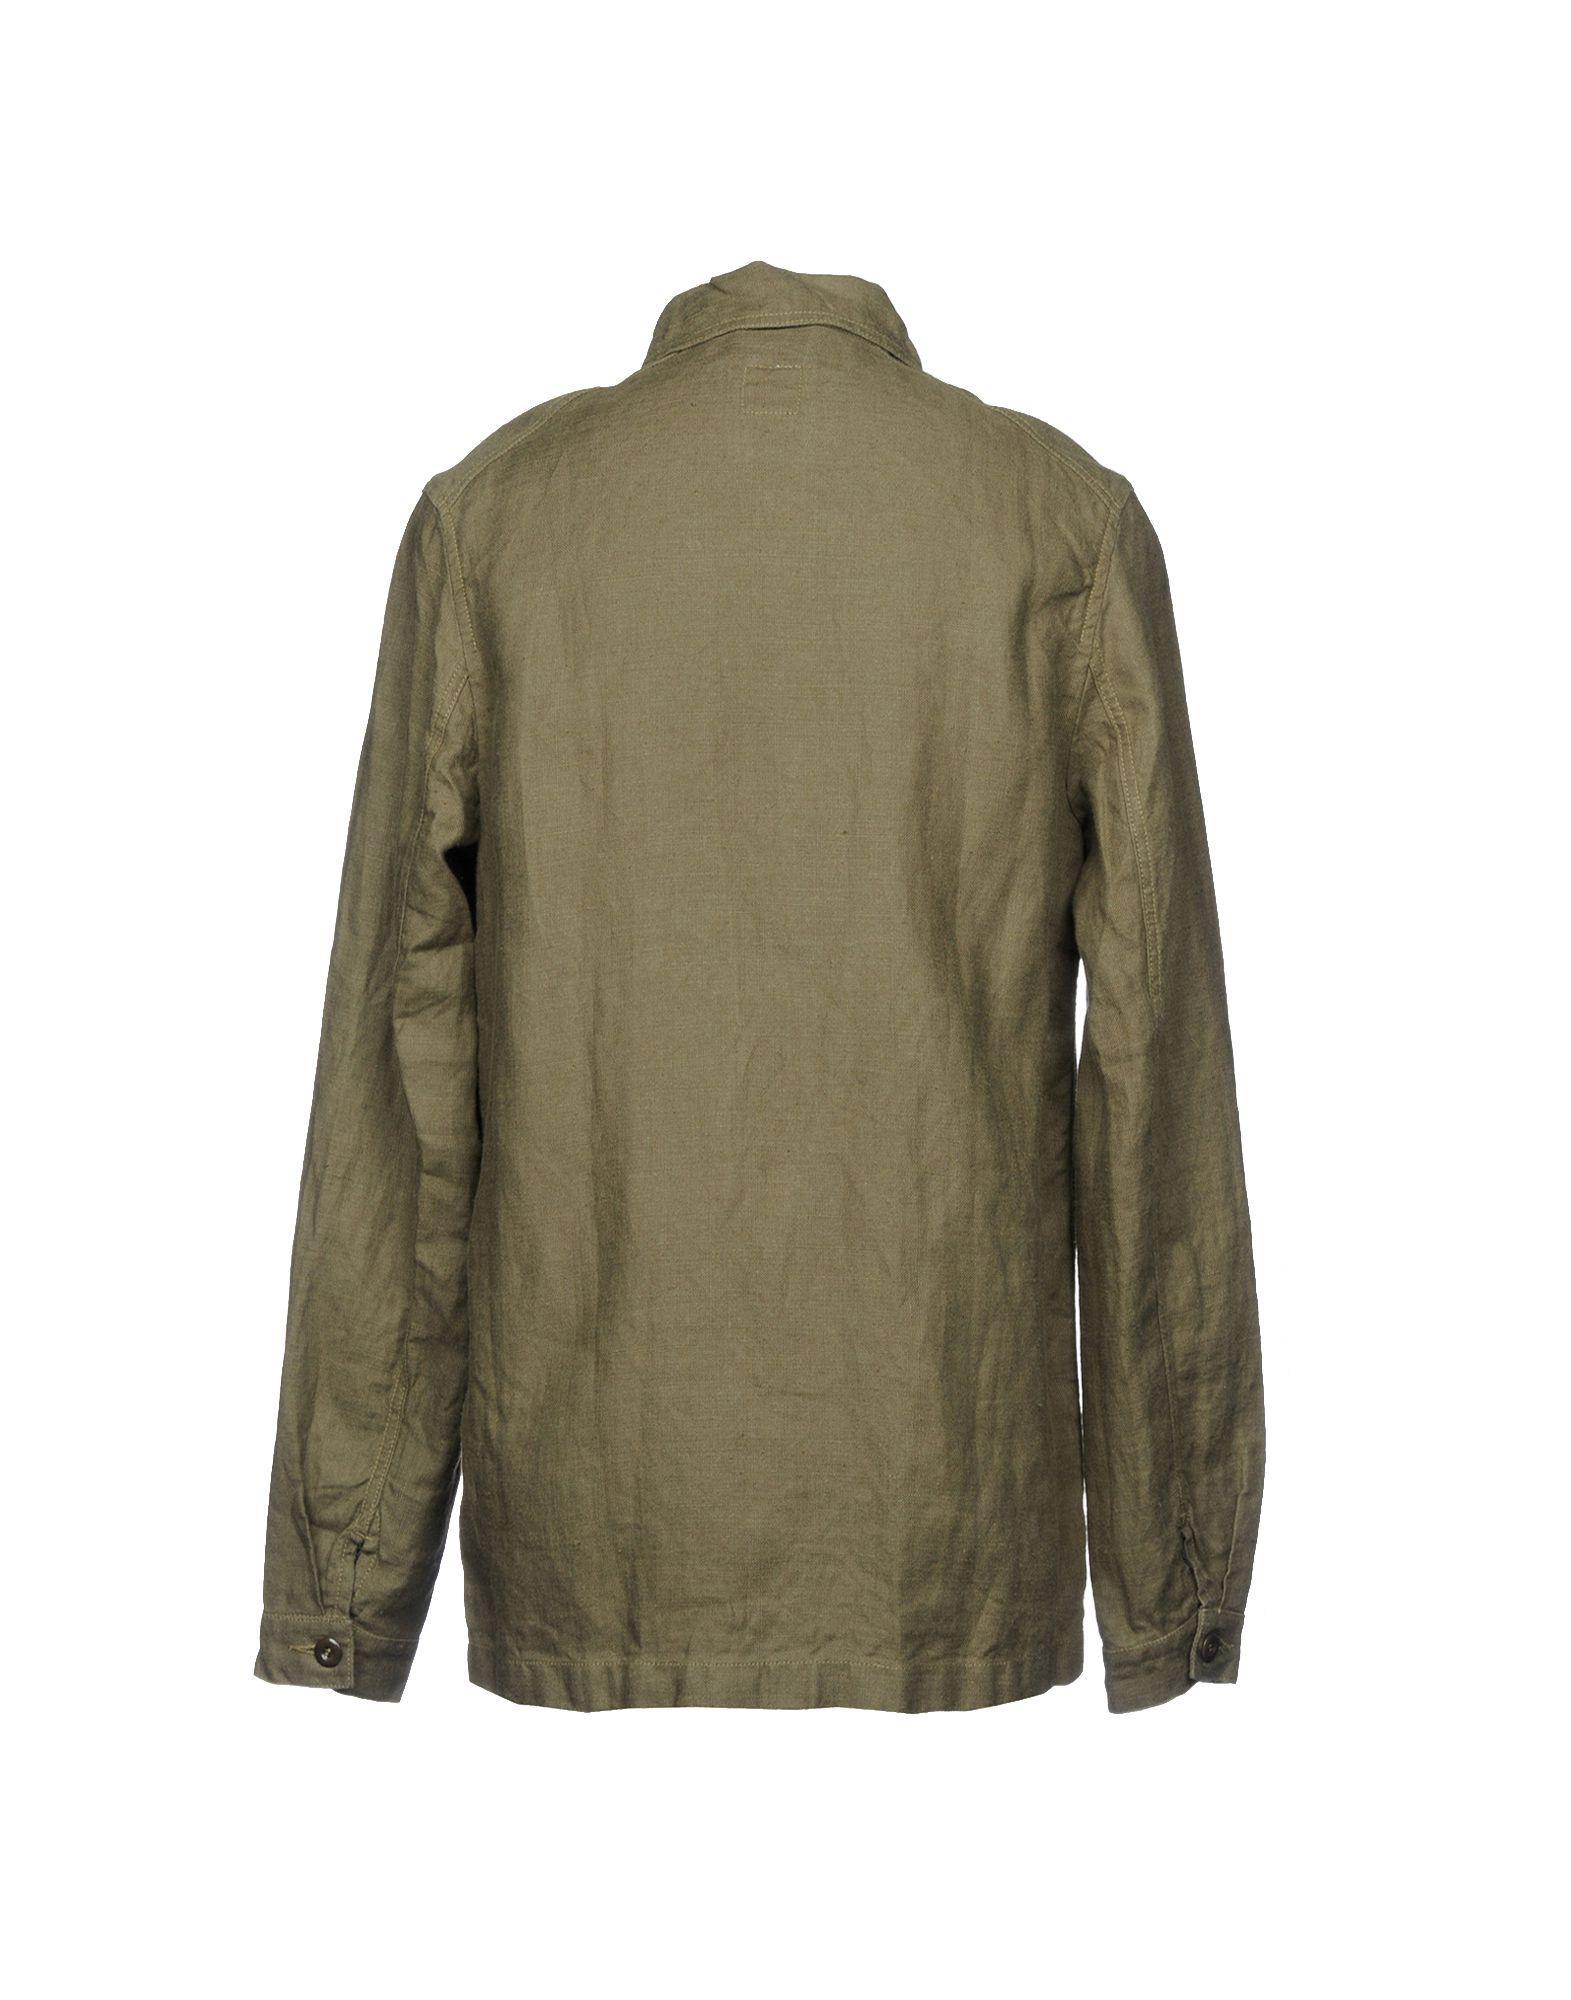 Arpenteur Linen Jacket in Military Green (Green) for Men